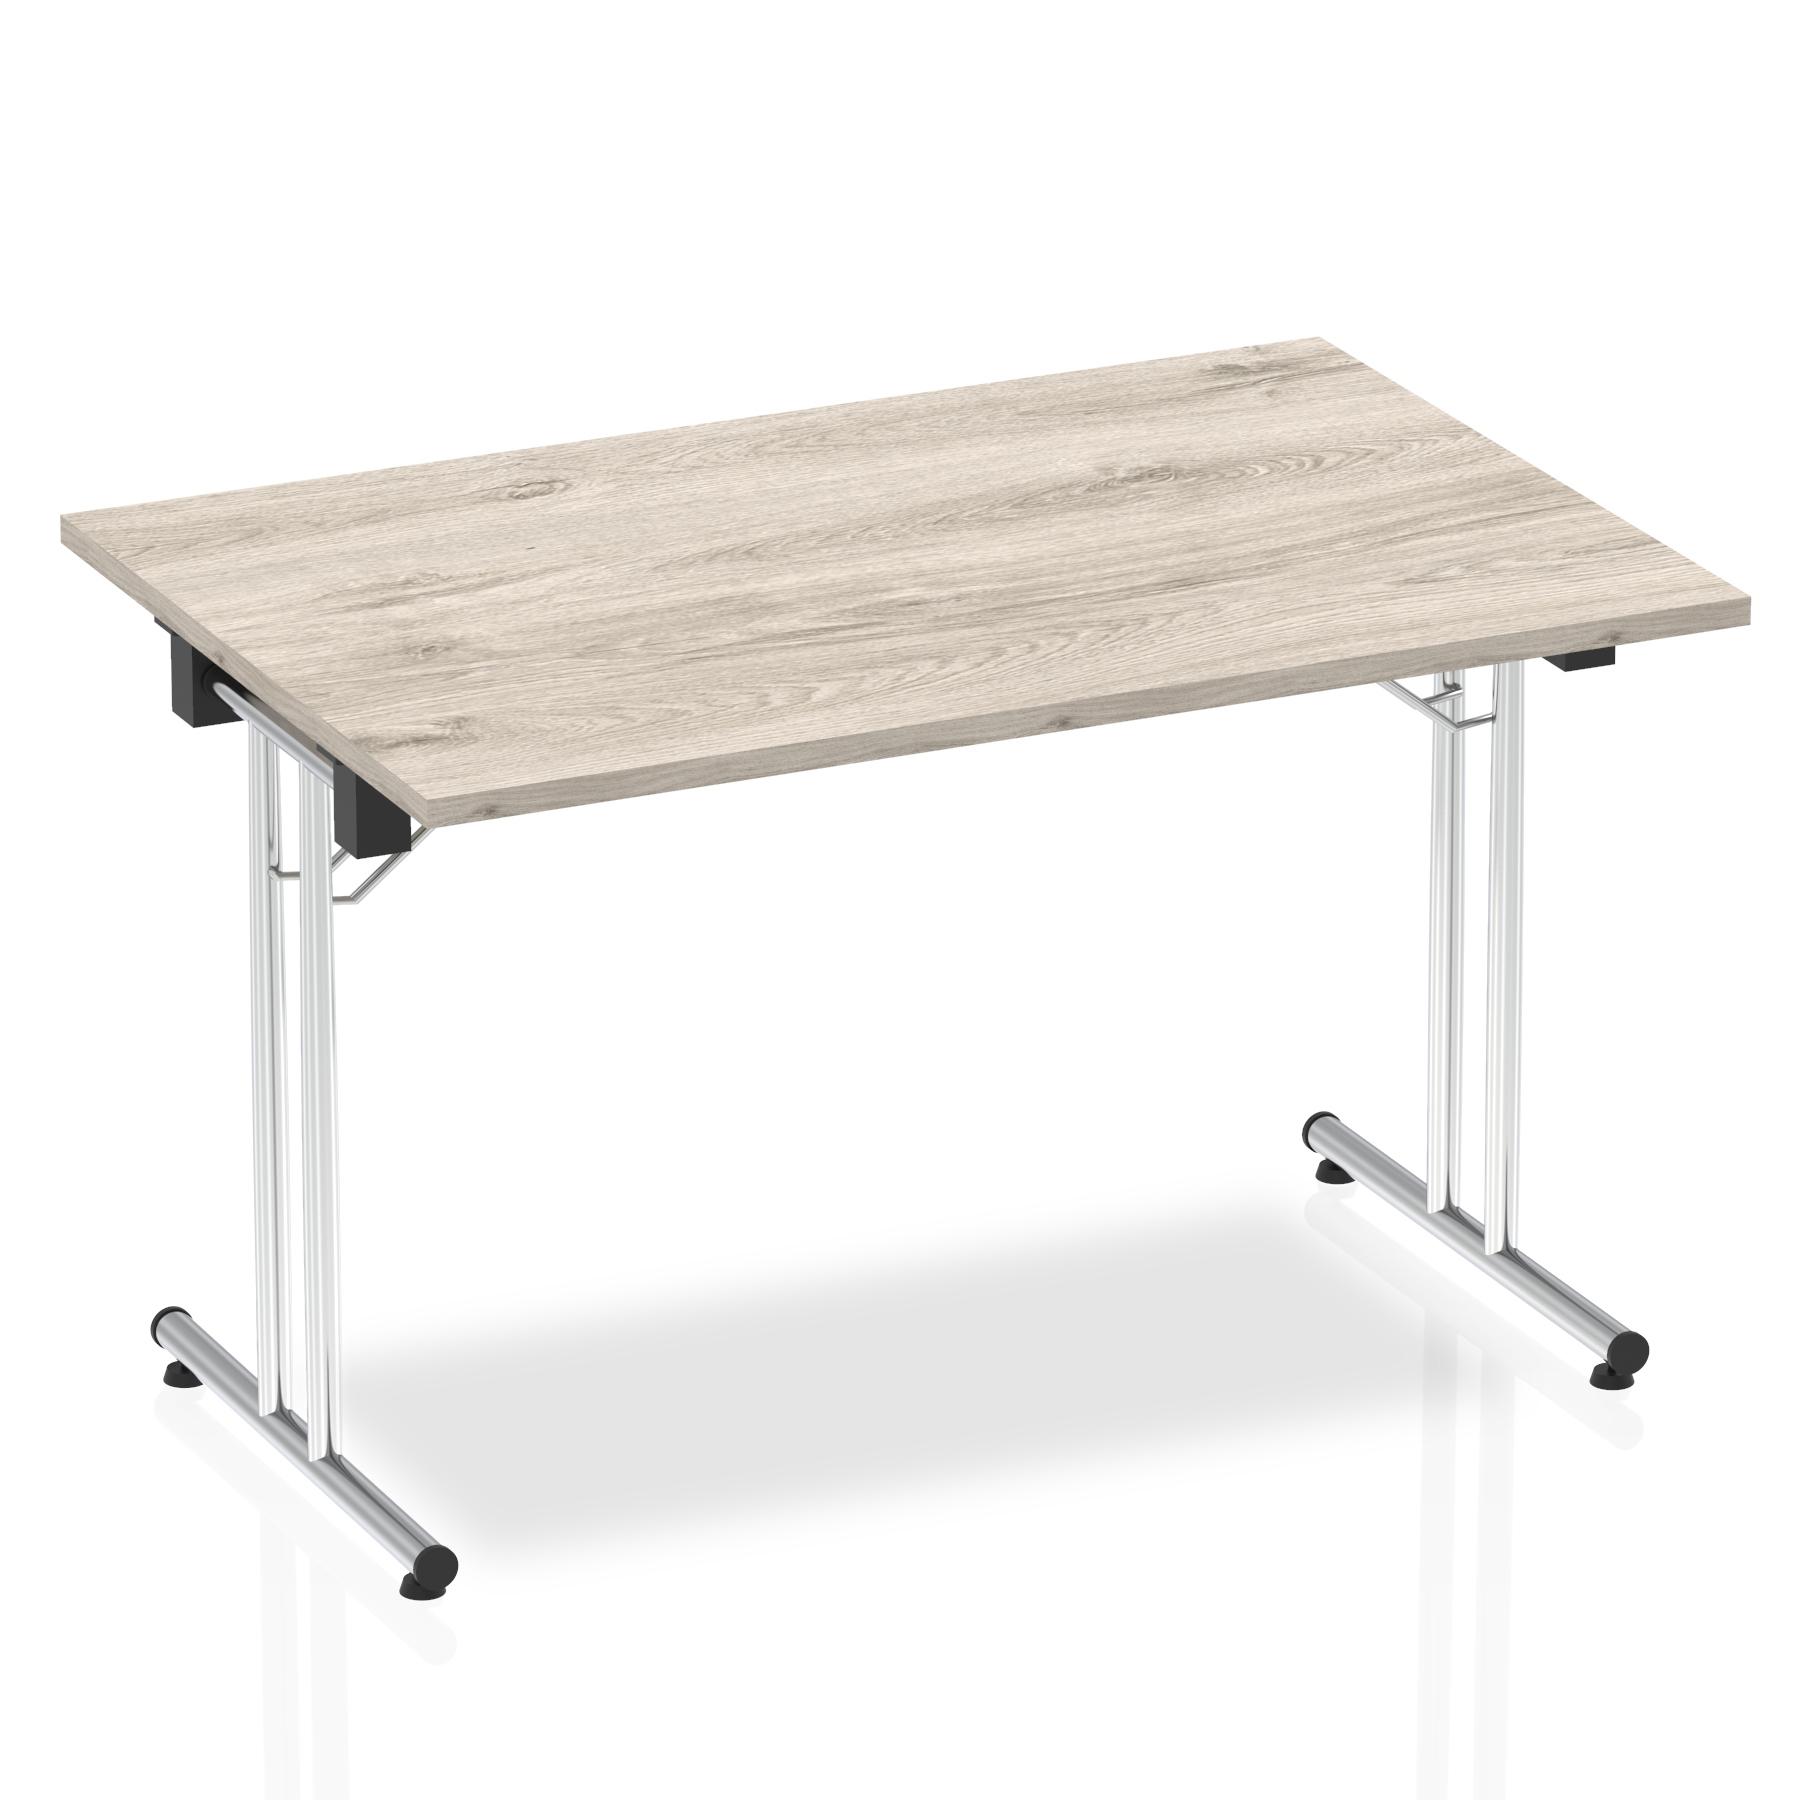 Sonix Rectangular Chrome Leg Folding Meeting Table 1200x800mm Grey Oak Ref